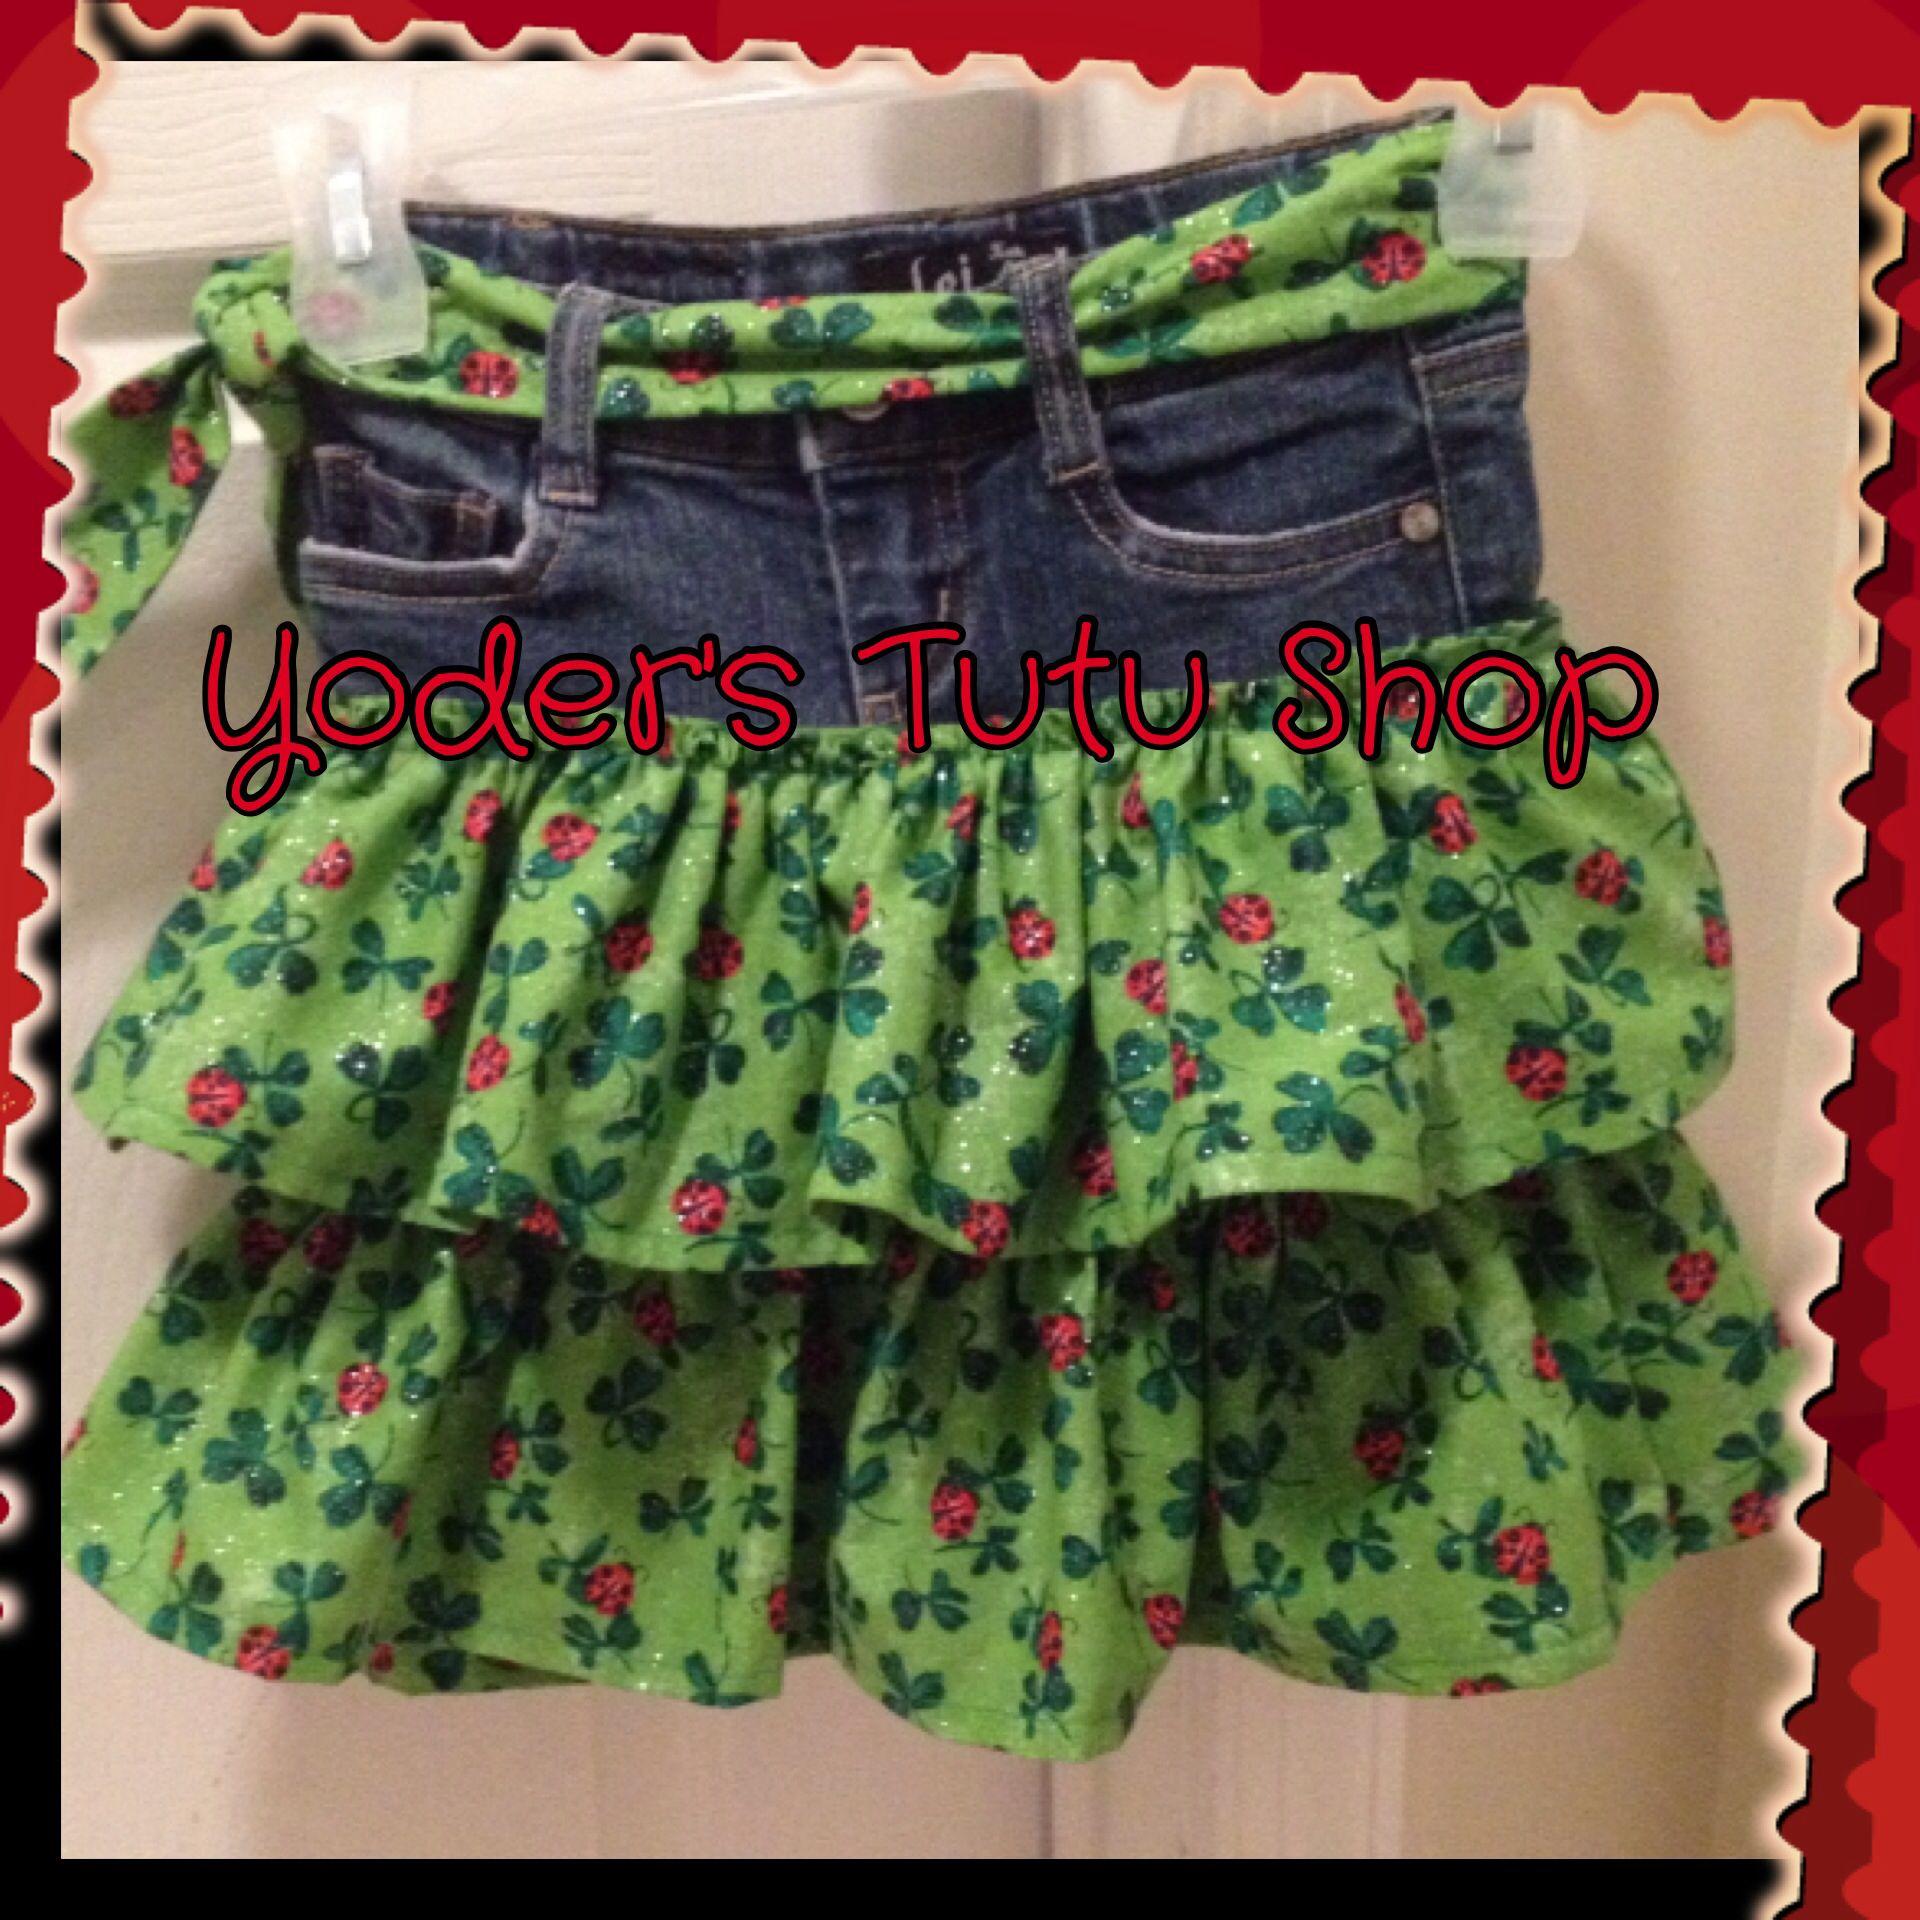 Upcycled Jean Ruffle Skirt, St. Patrick's Day Shamrock Skirt.  #yoderstutushop like our Facebook page www.facebook.com/yoderstutushop & follow us in Instagram @yoderstutushop